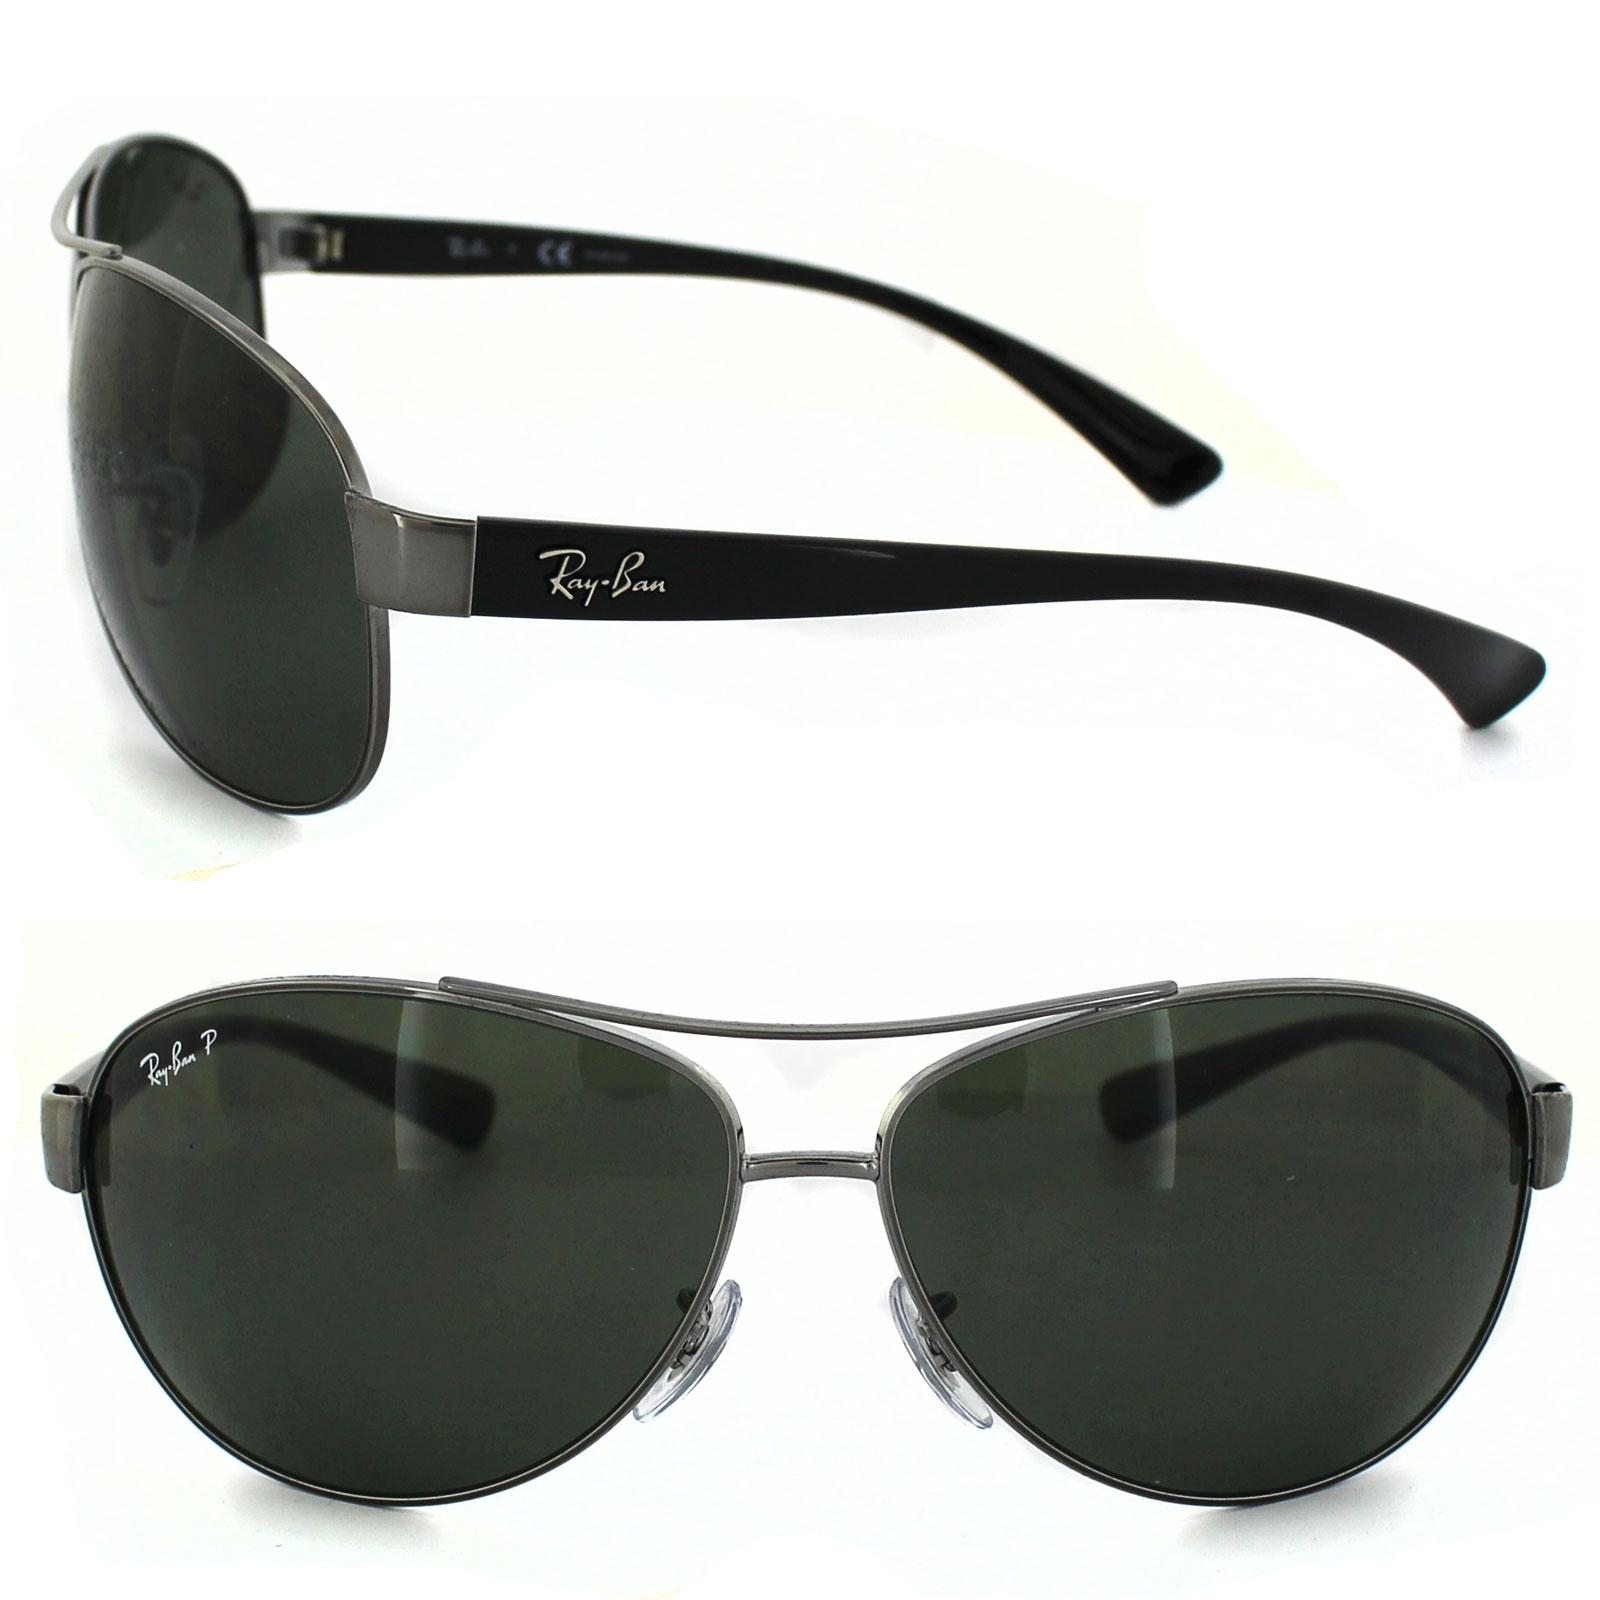 c8b4f4f711 Cheap Ray-Ban 3386 Sunglasses - Discounted Sunglasses